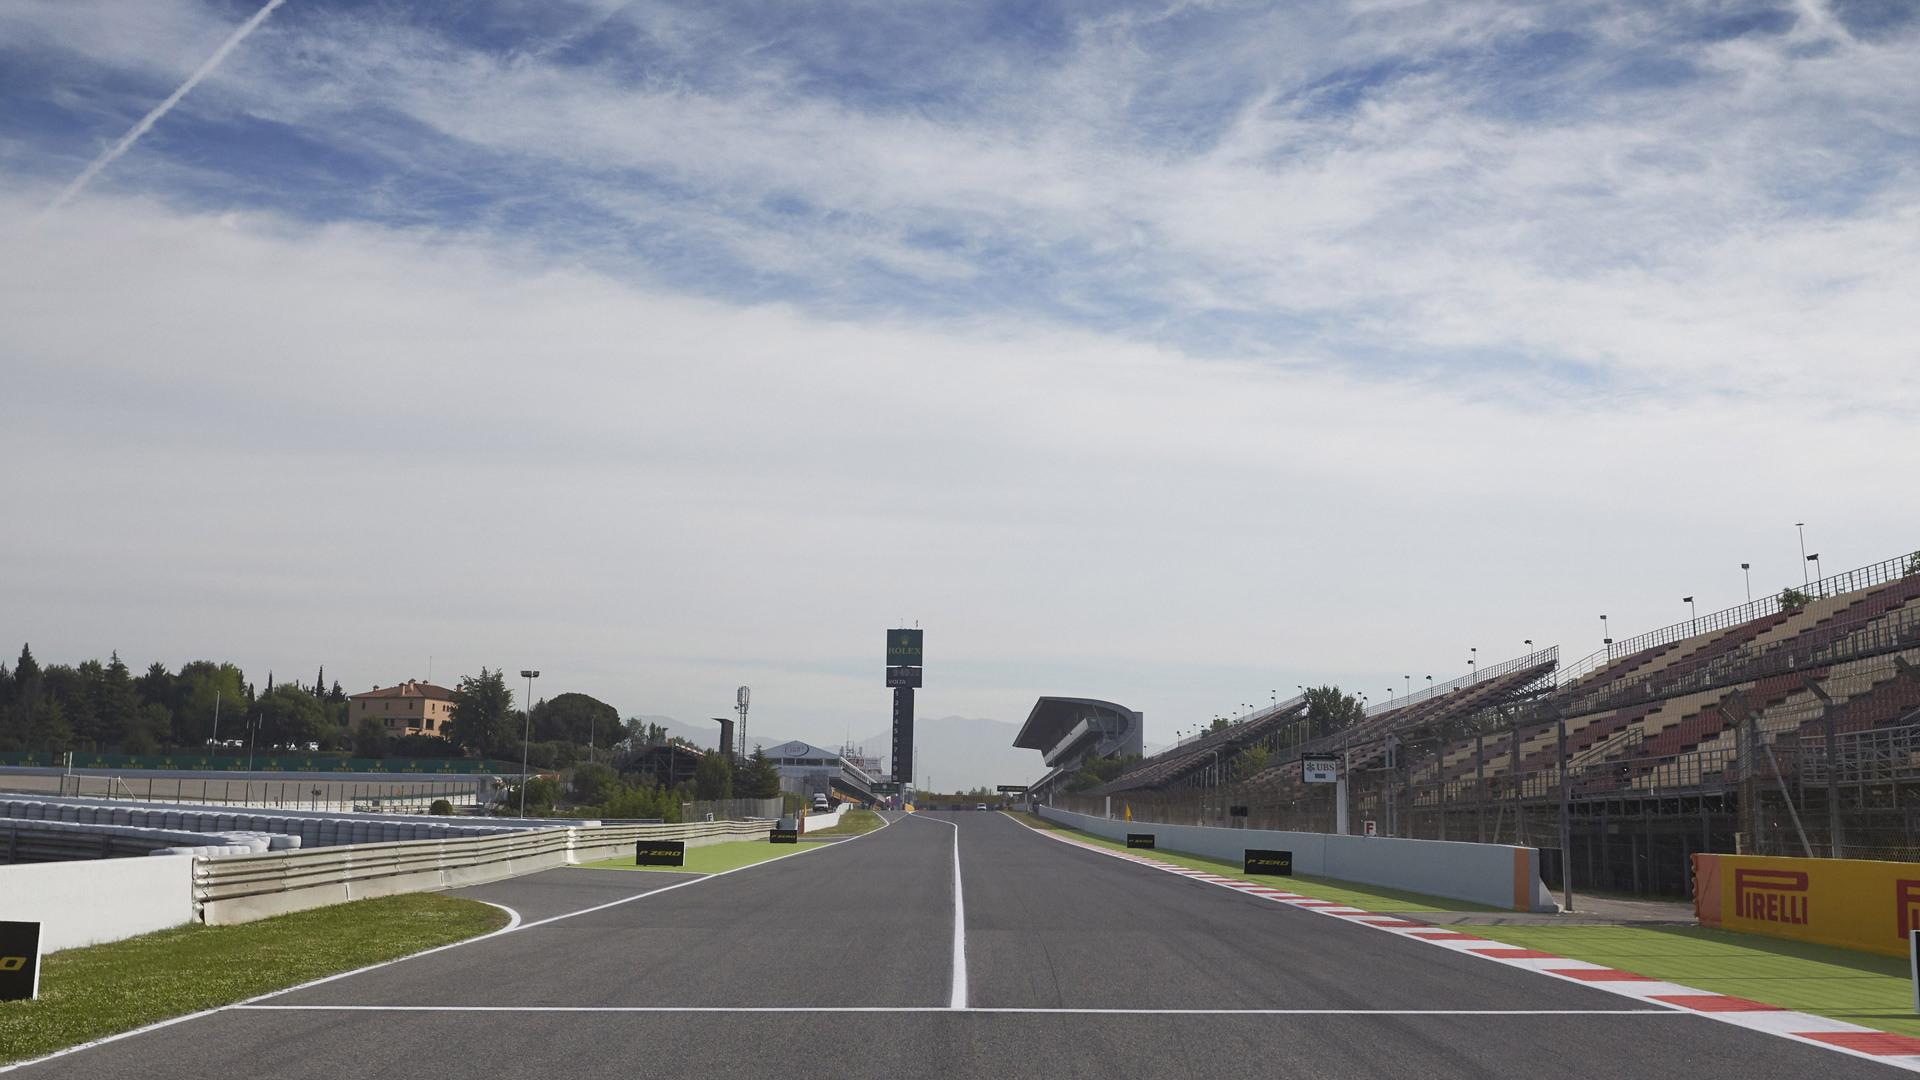 Circuit de Catalunya, home of the Formula 1 Spanish Grand Prix